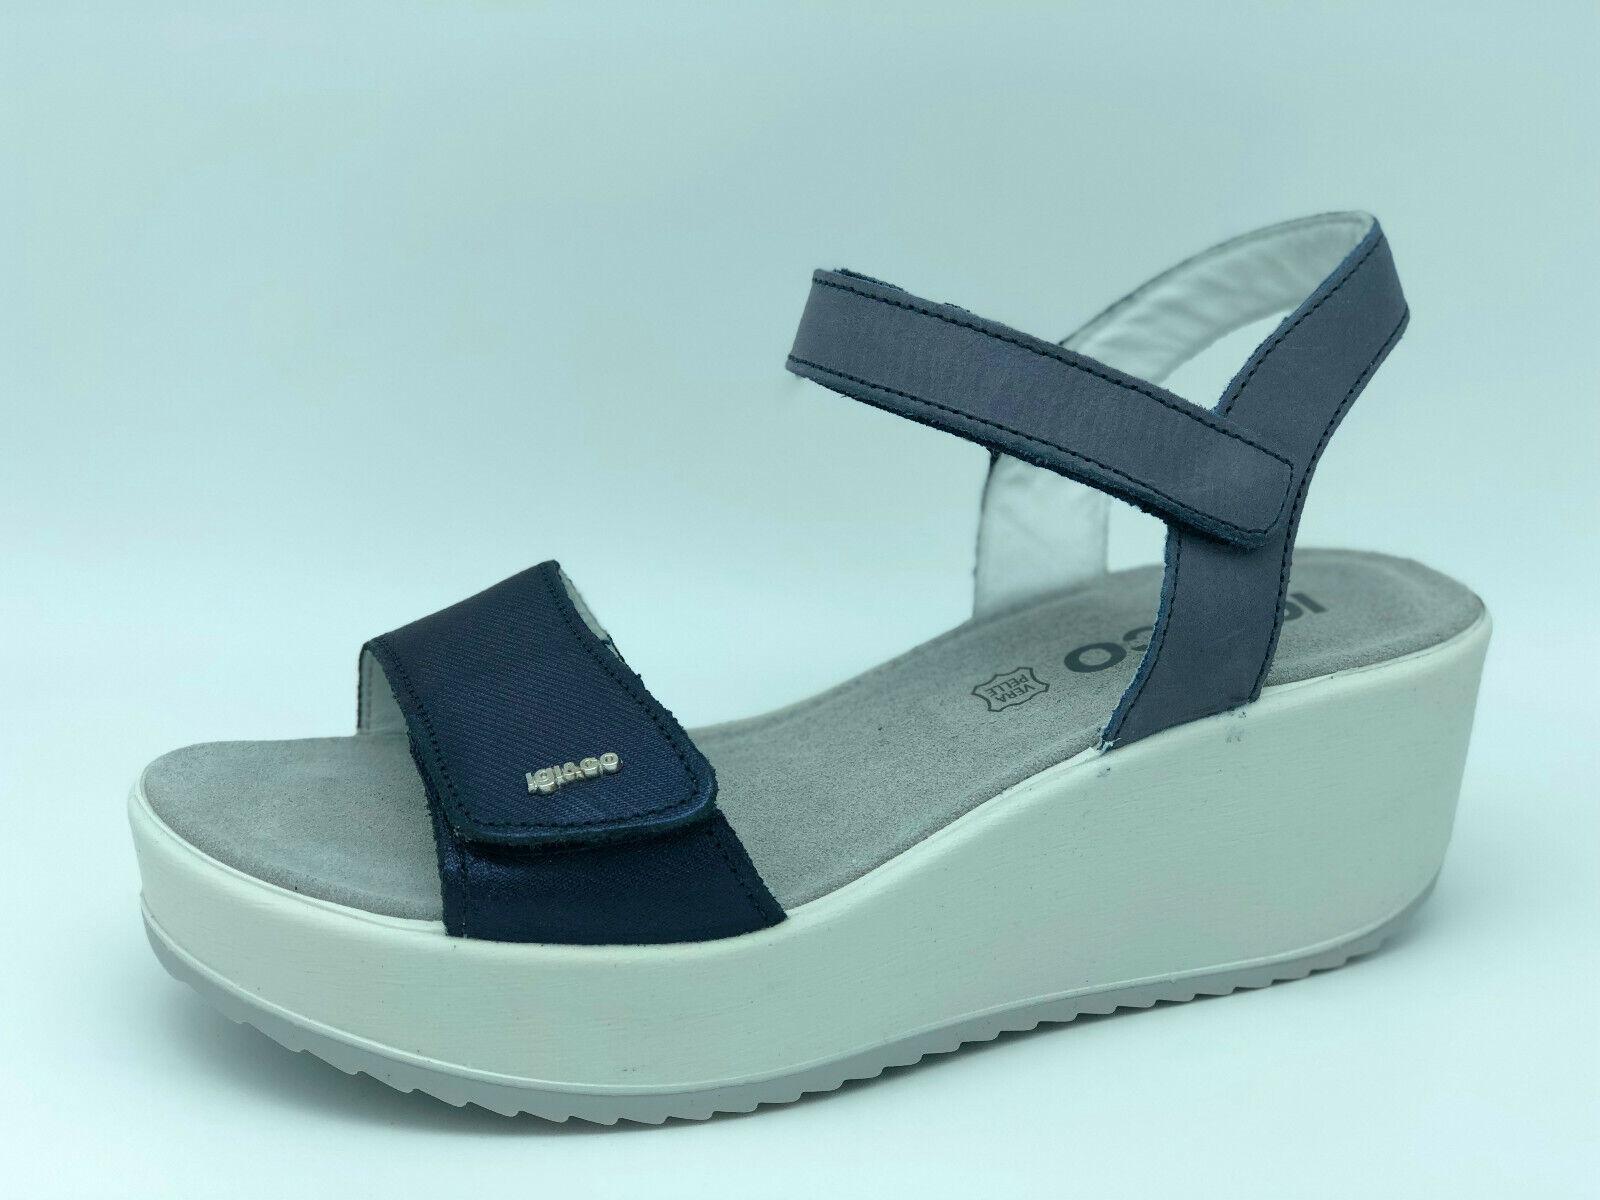 Sandals Tear igi&co 1176355 bluee Leather Wedge 6 cm